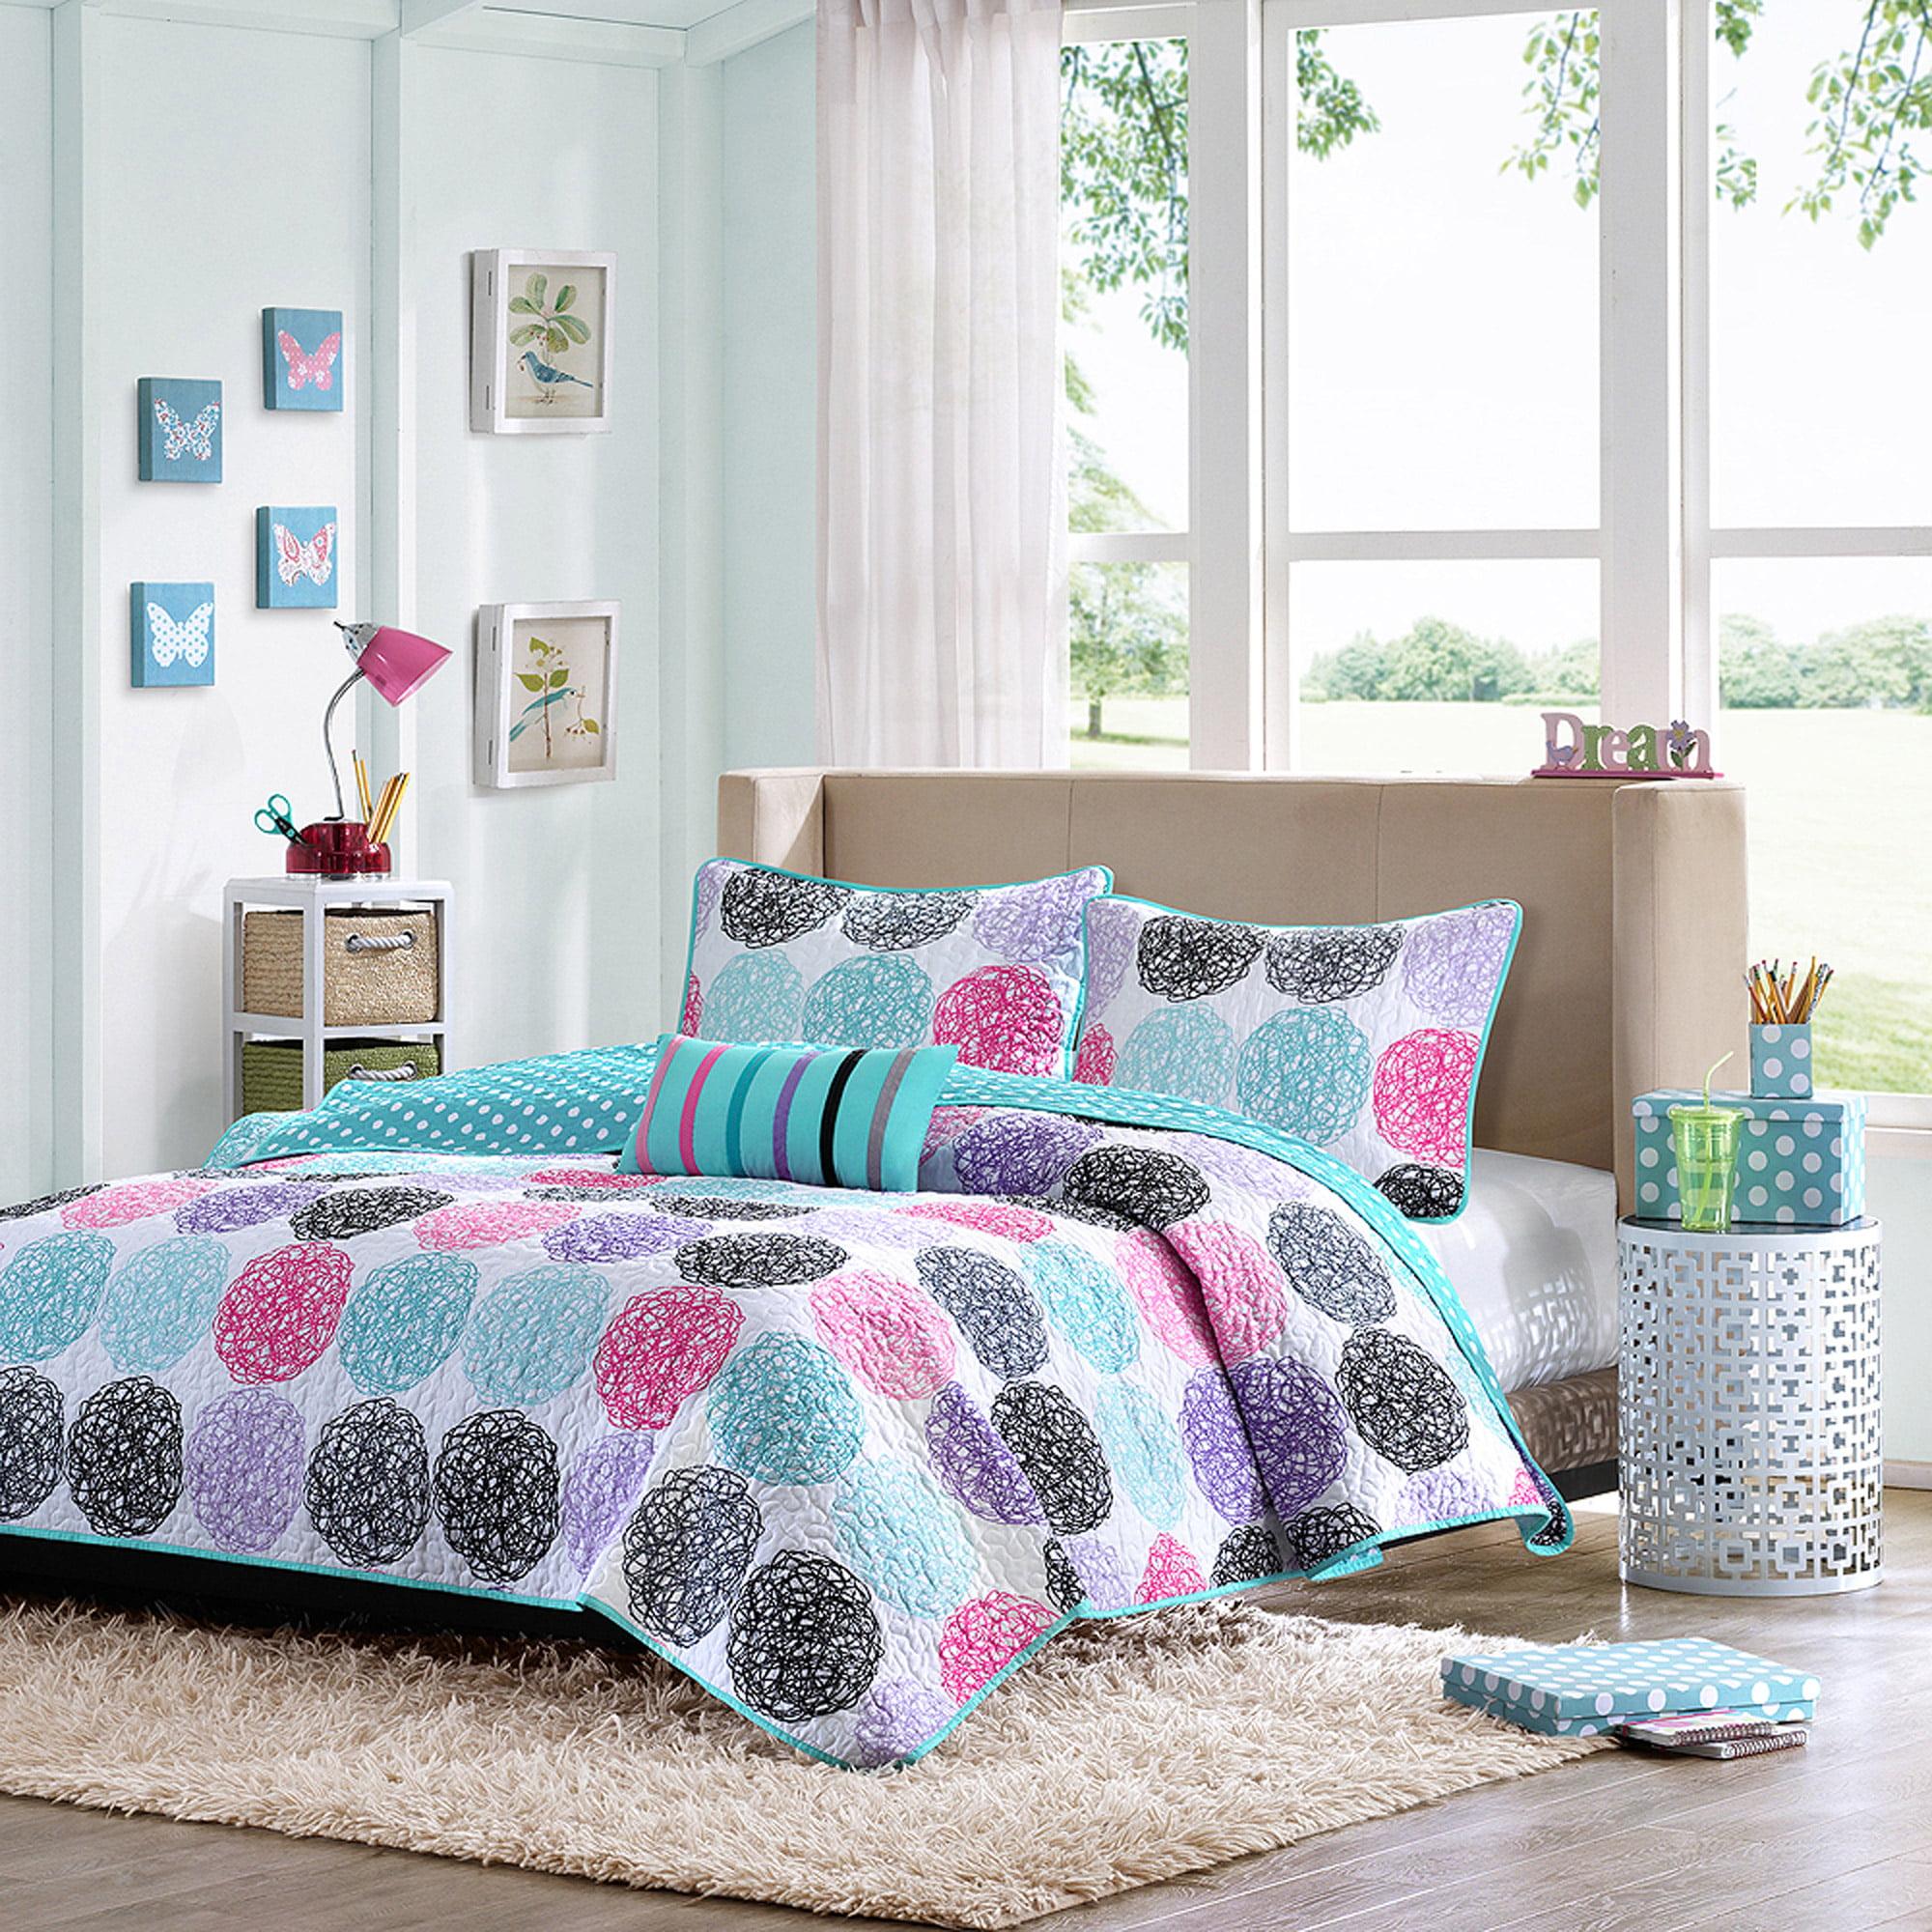 Blue and purple bedding - Blue And Purple Bedding 37